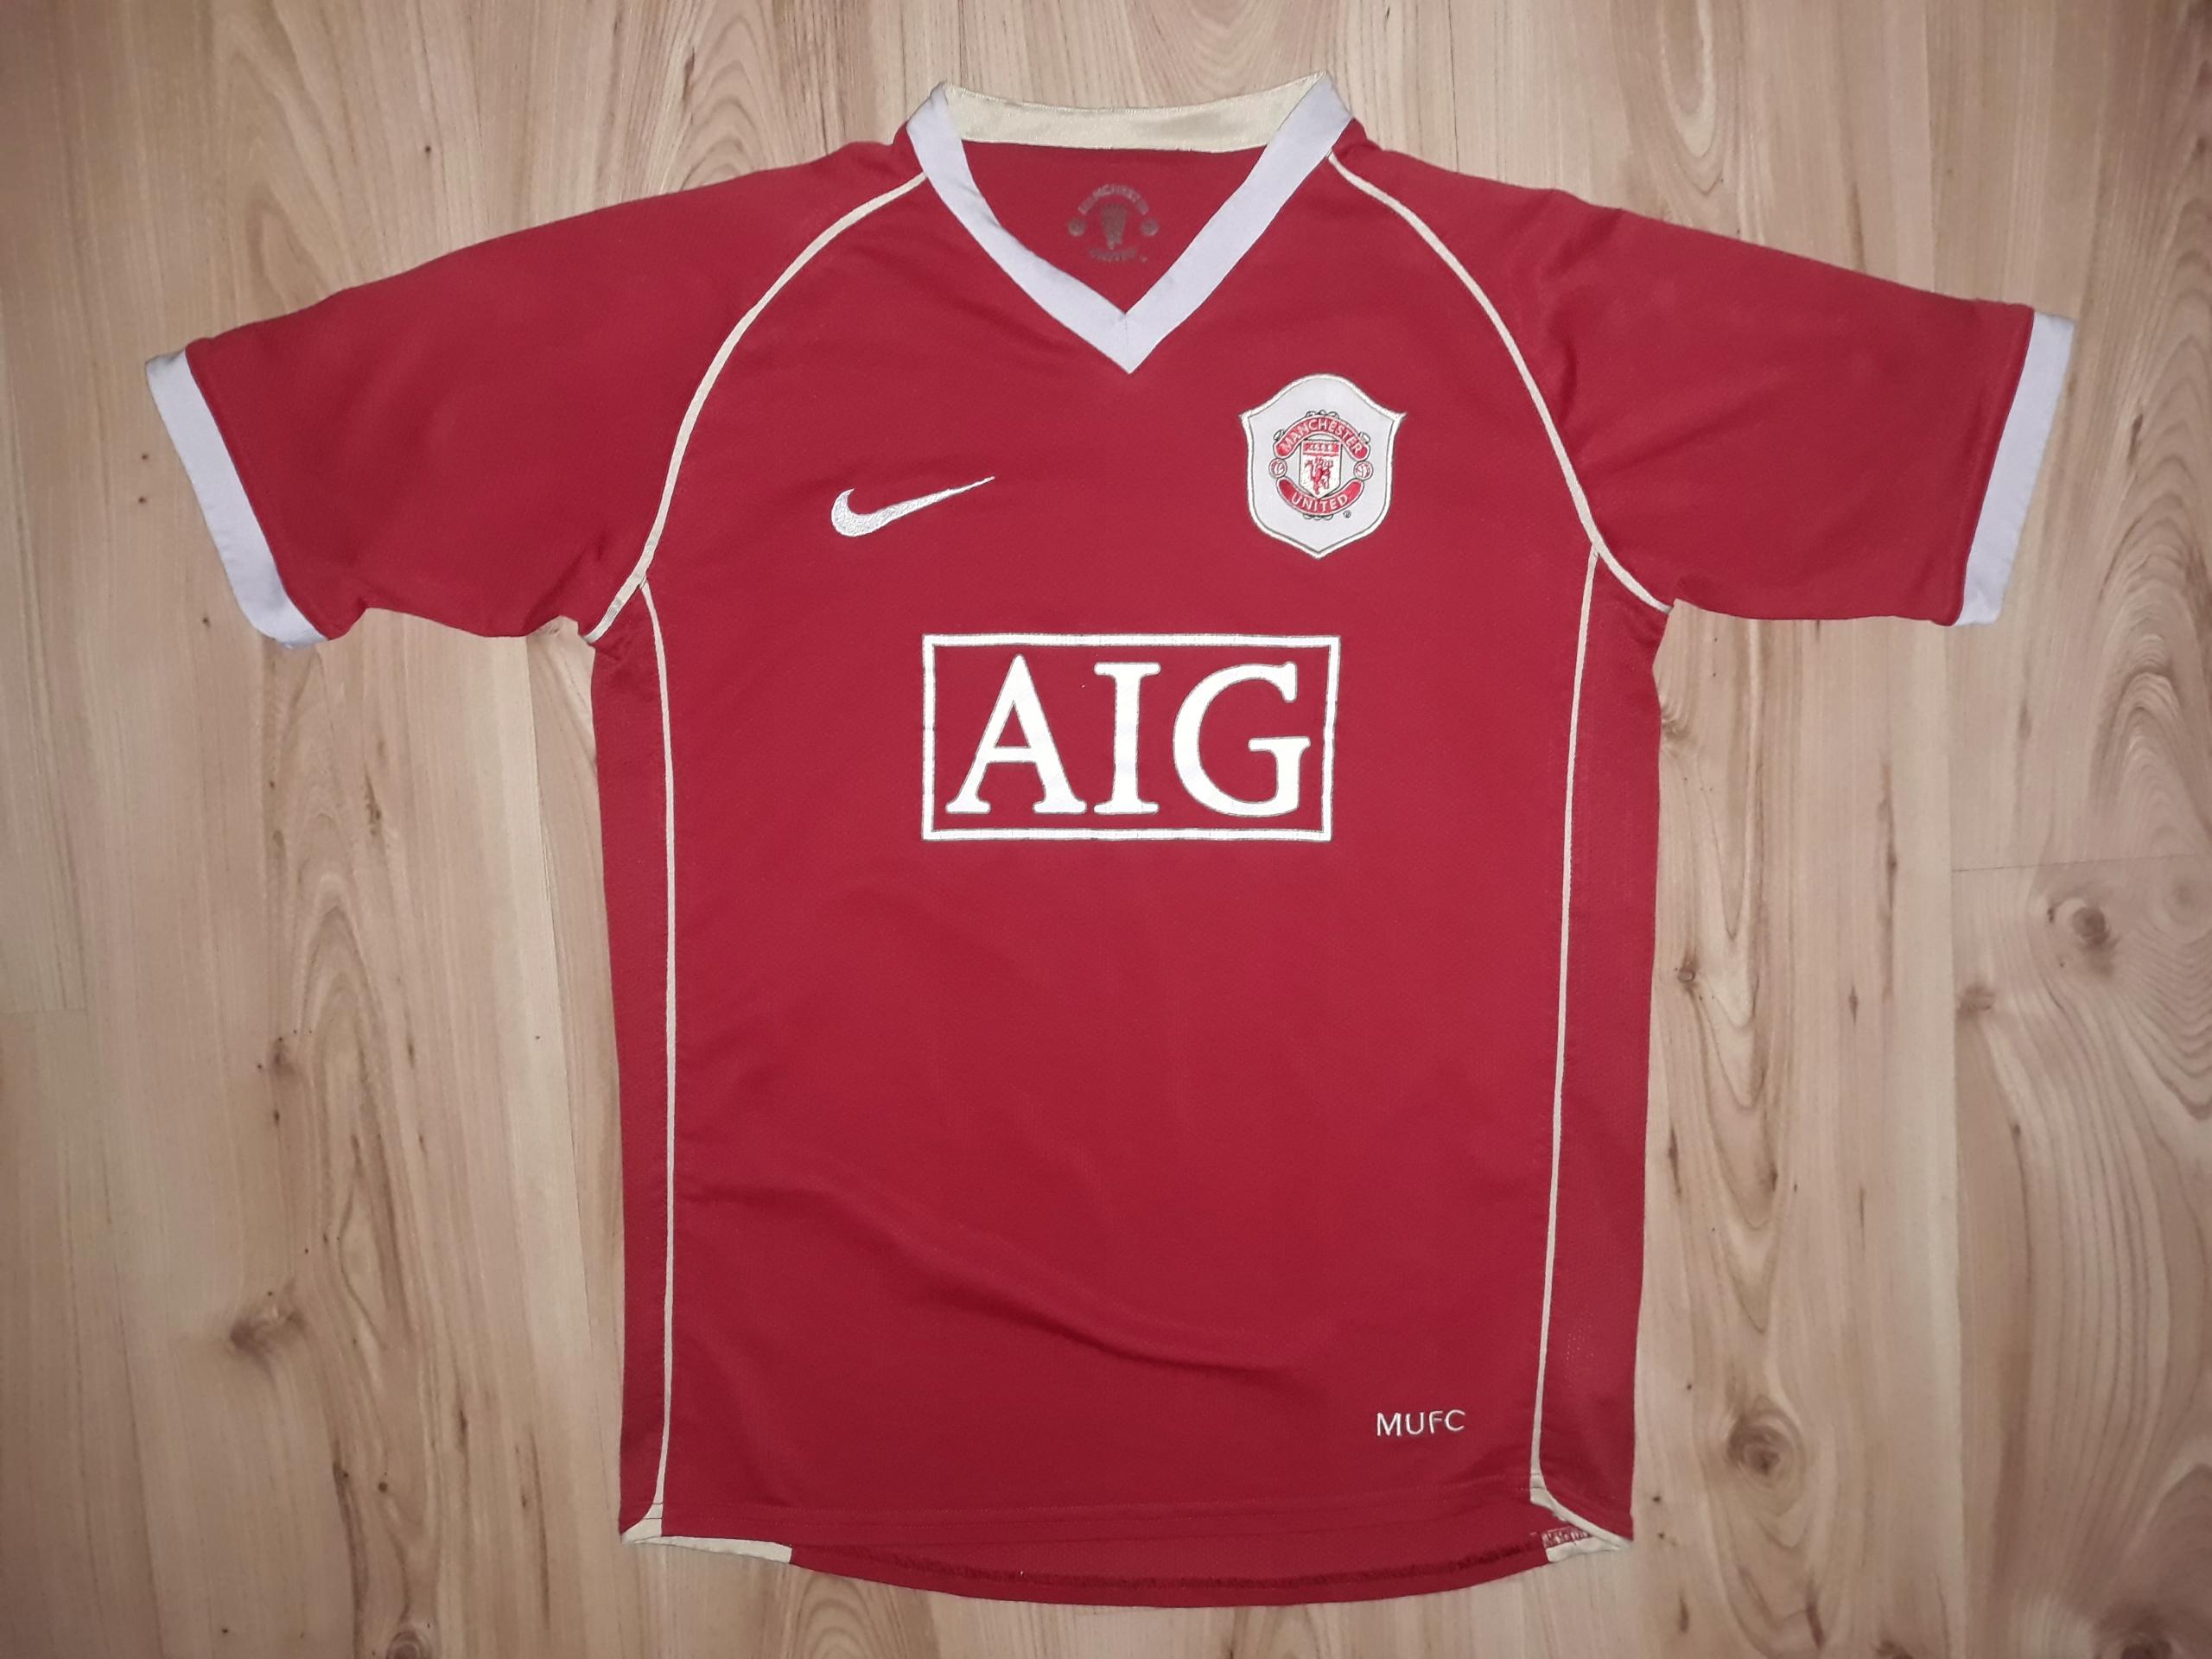 Koszulka Nike L Manchester United AIG Anglia